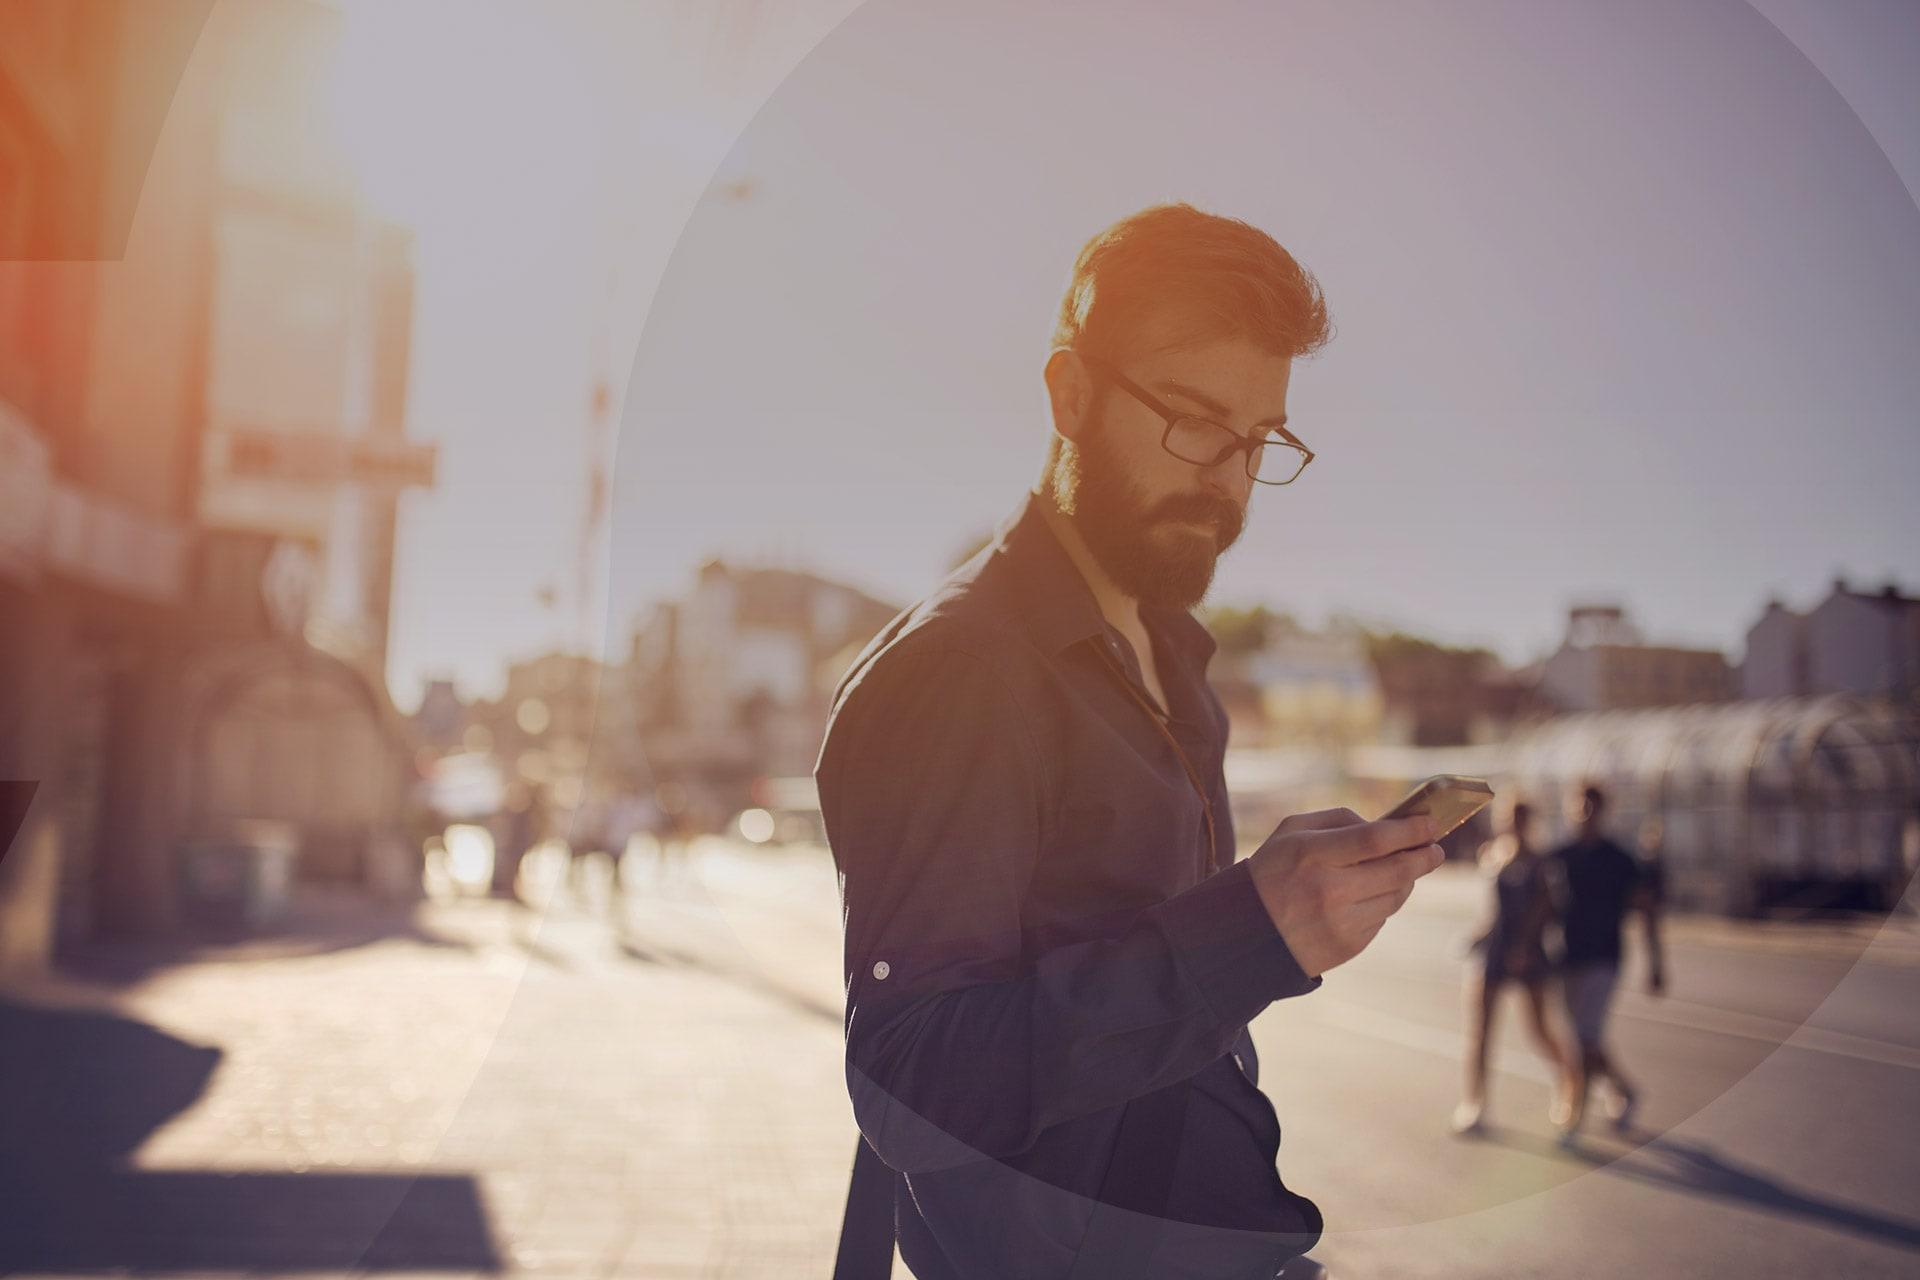 MoneySuperMarketGo photo of man looking at mobile phone